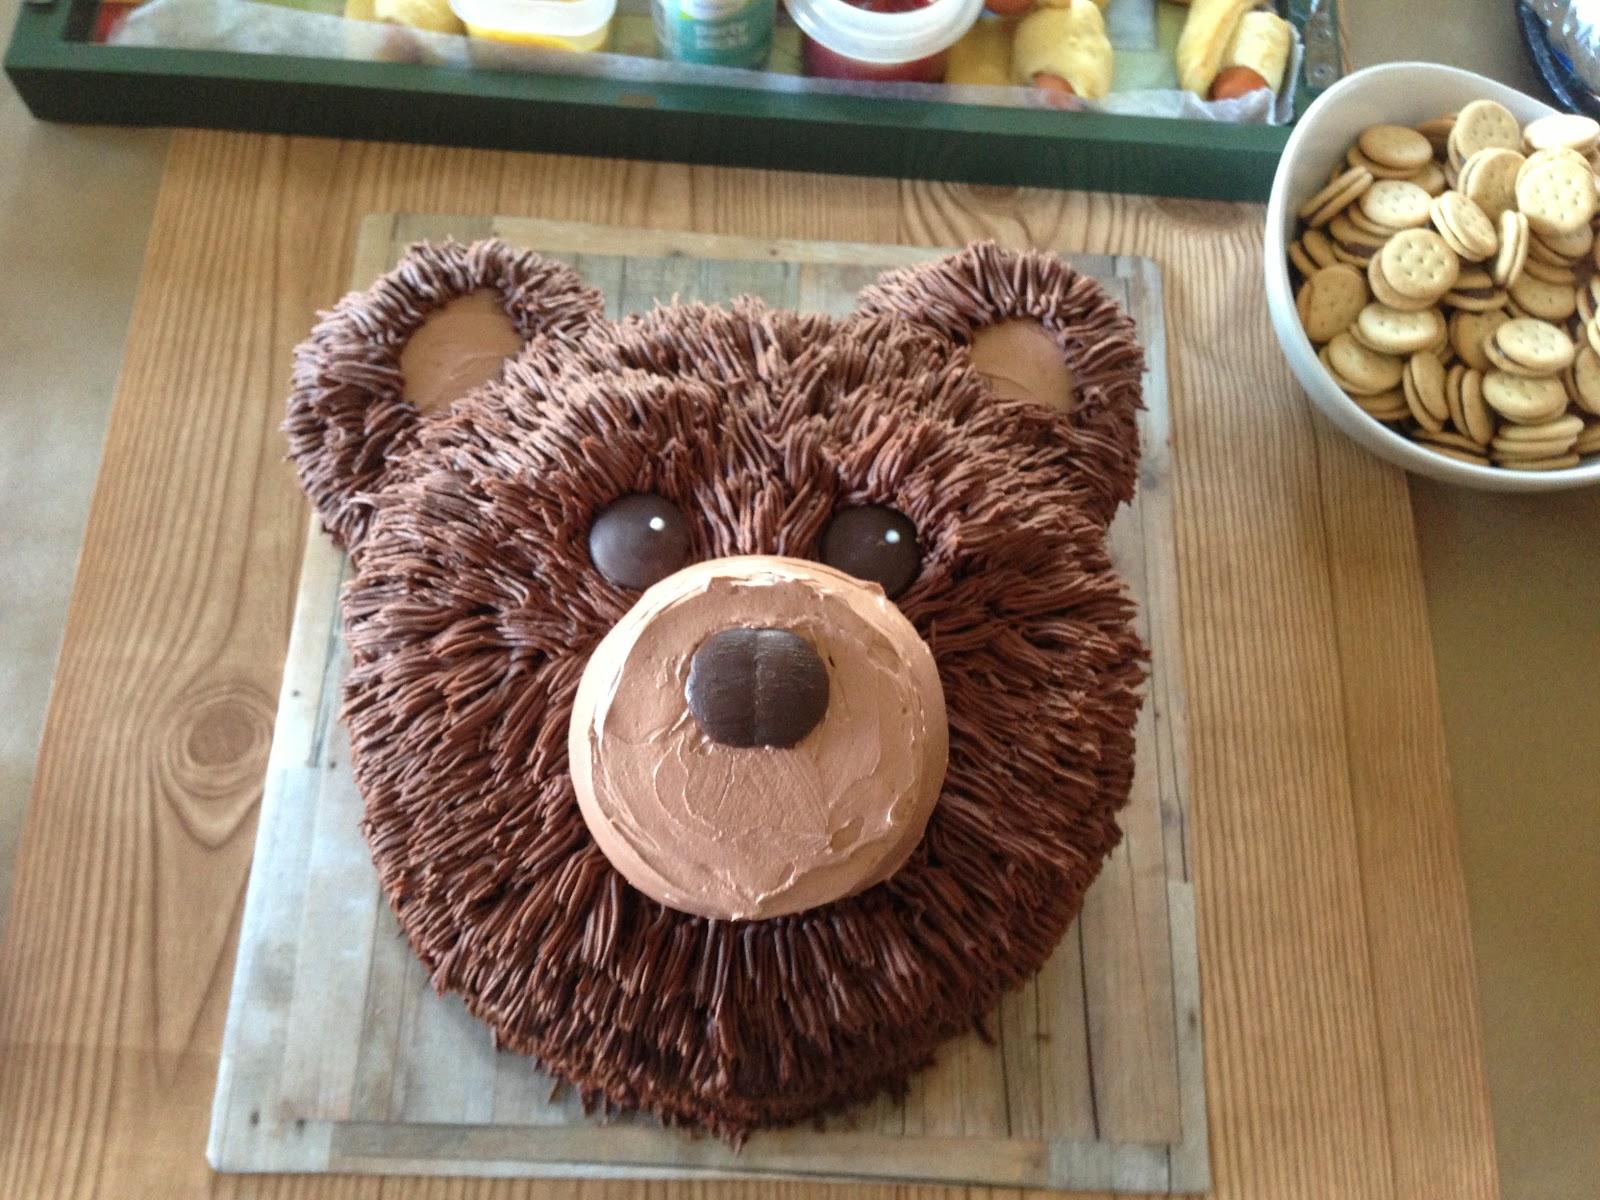 Bear Face Cake Recipe